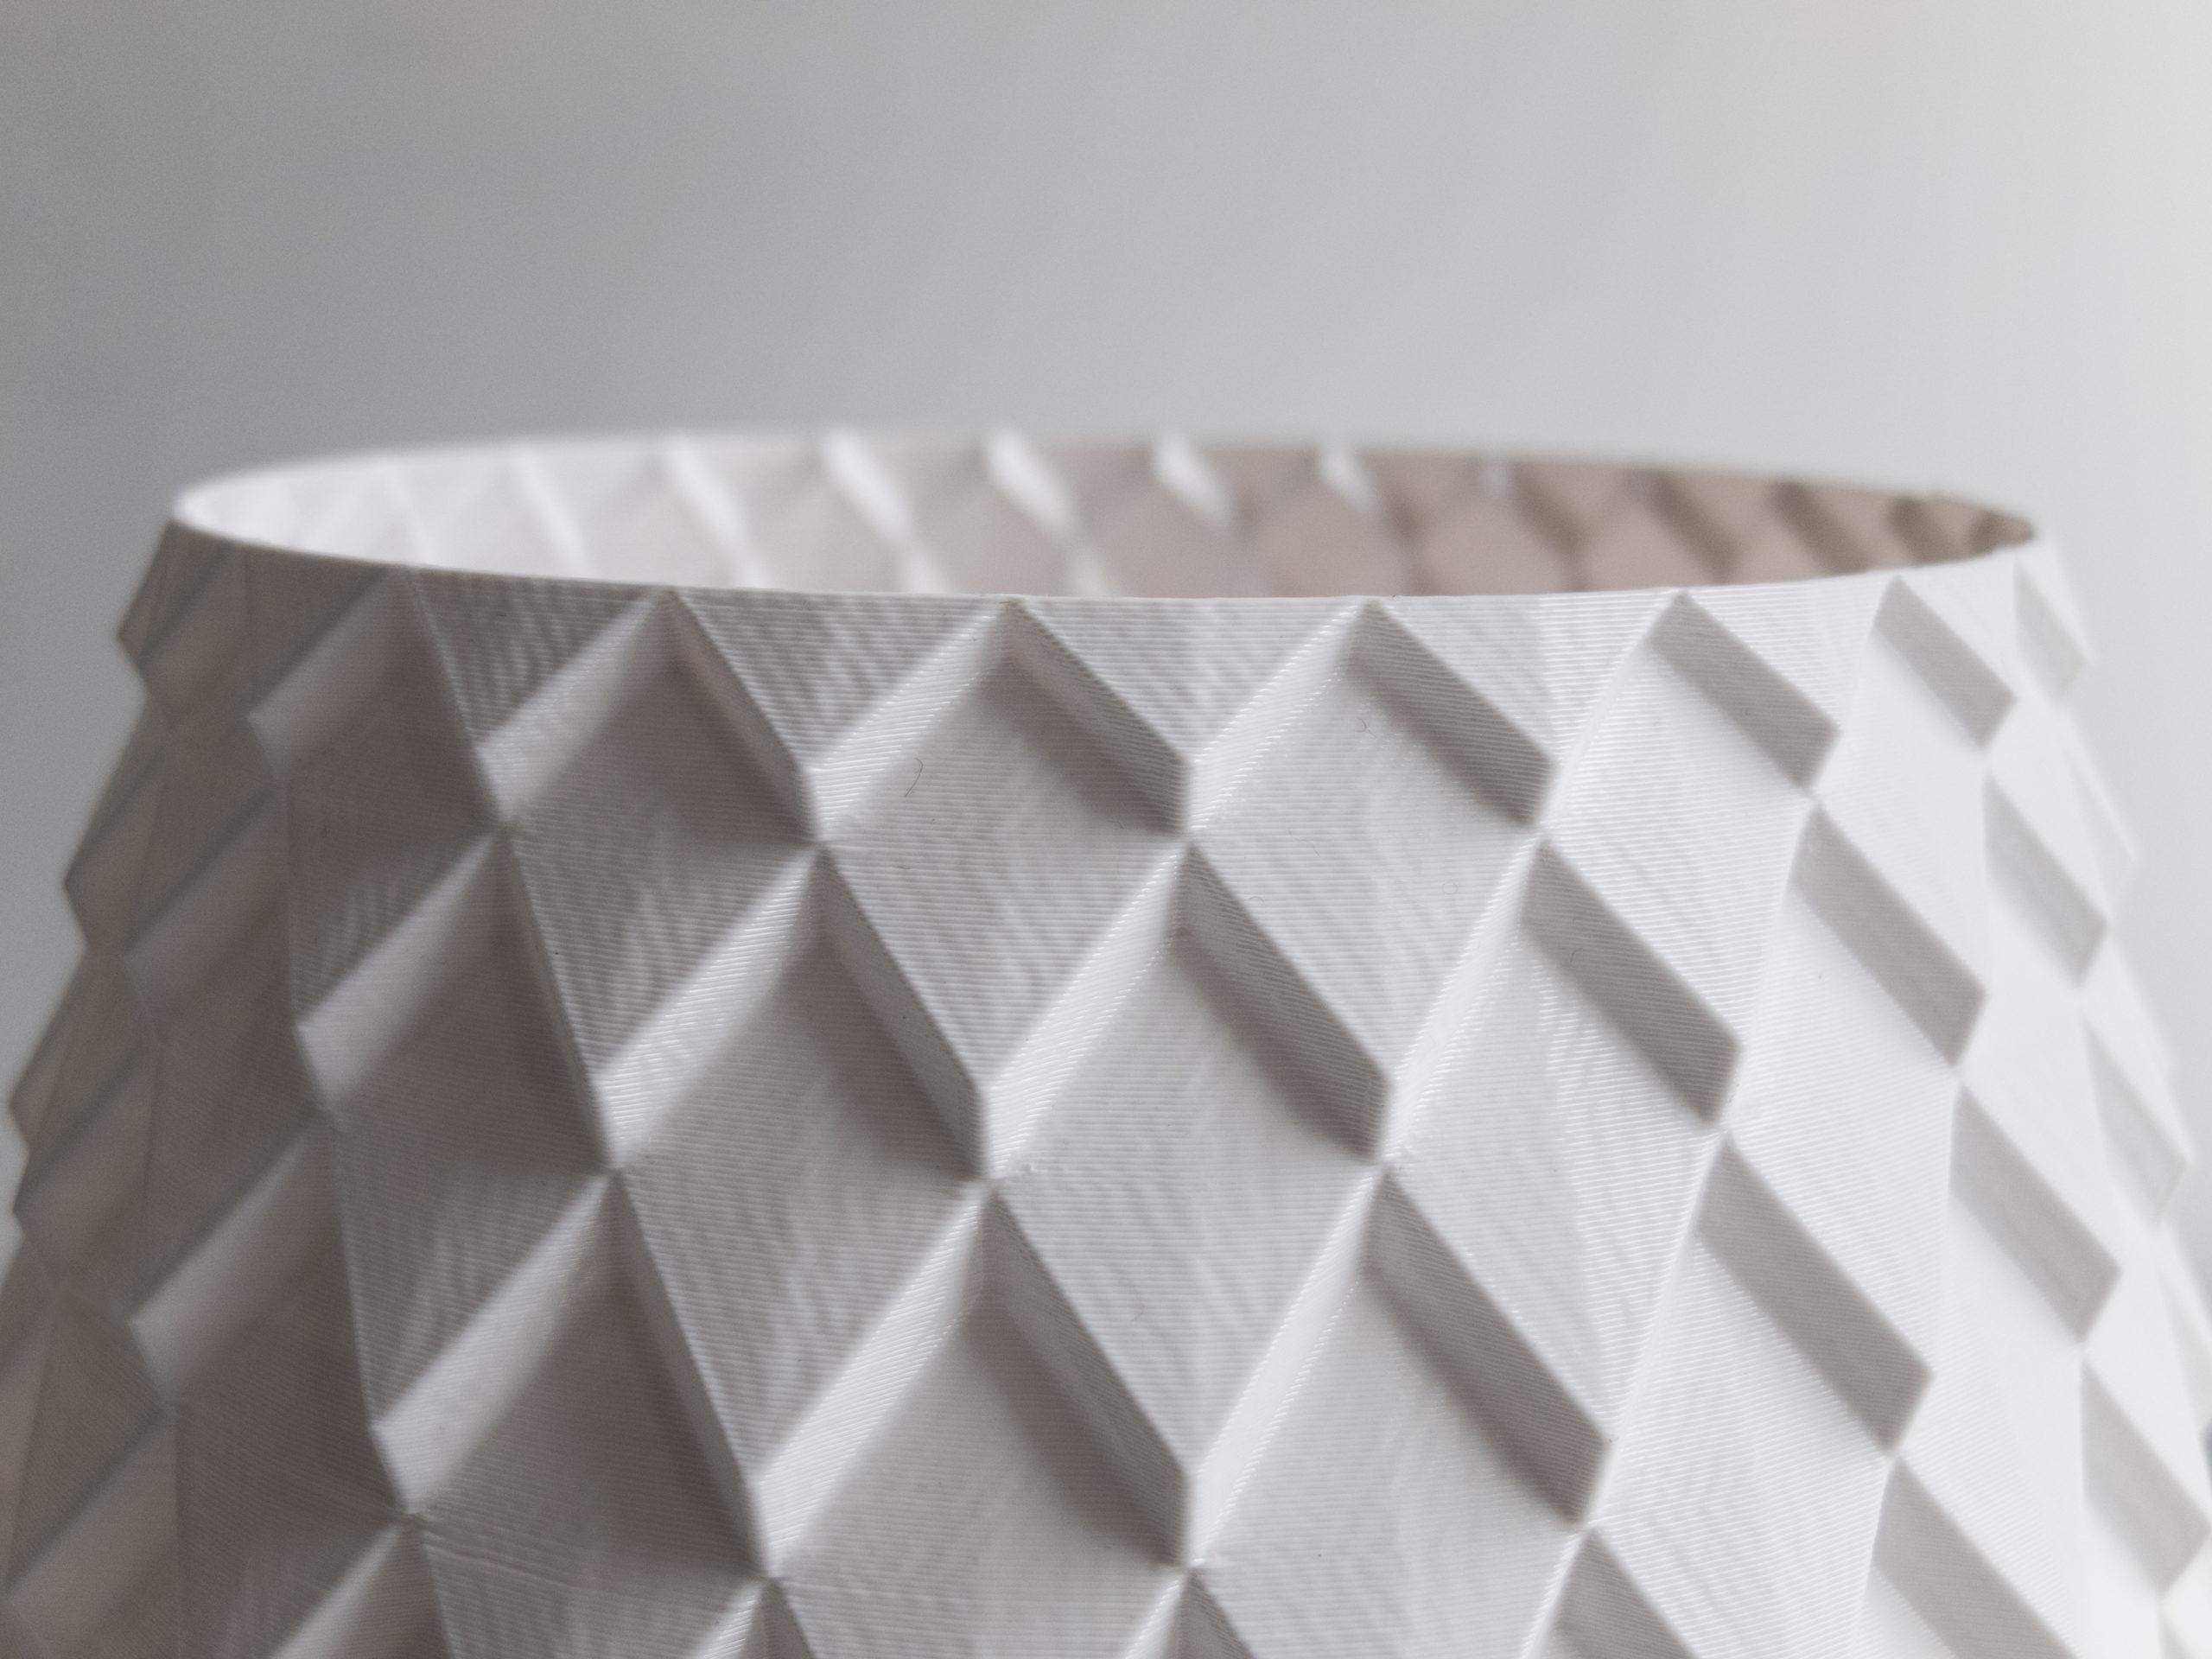 Detail photo of 3d printed parametric vase design